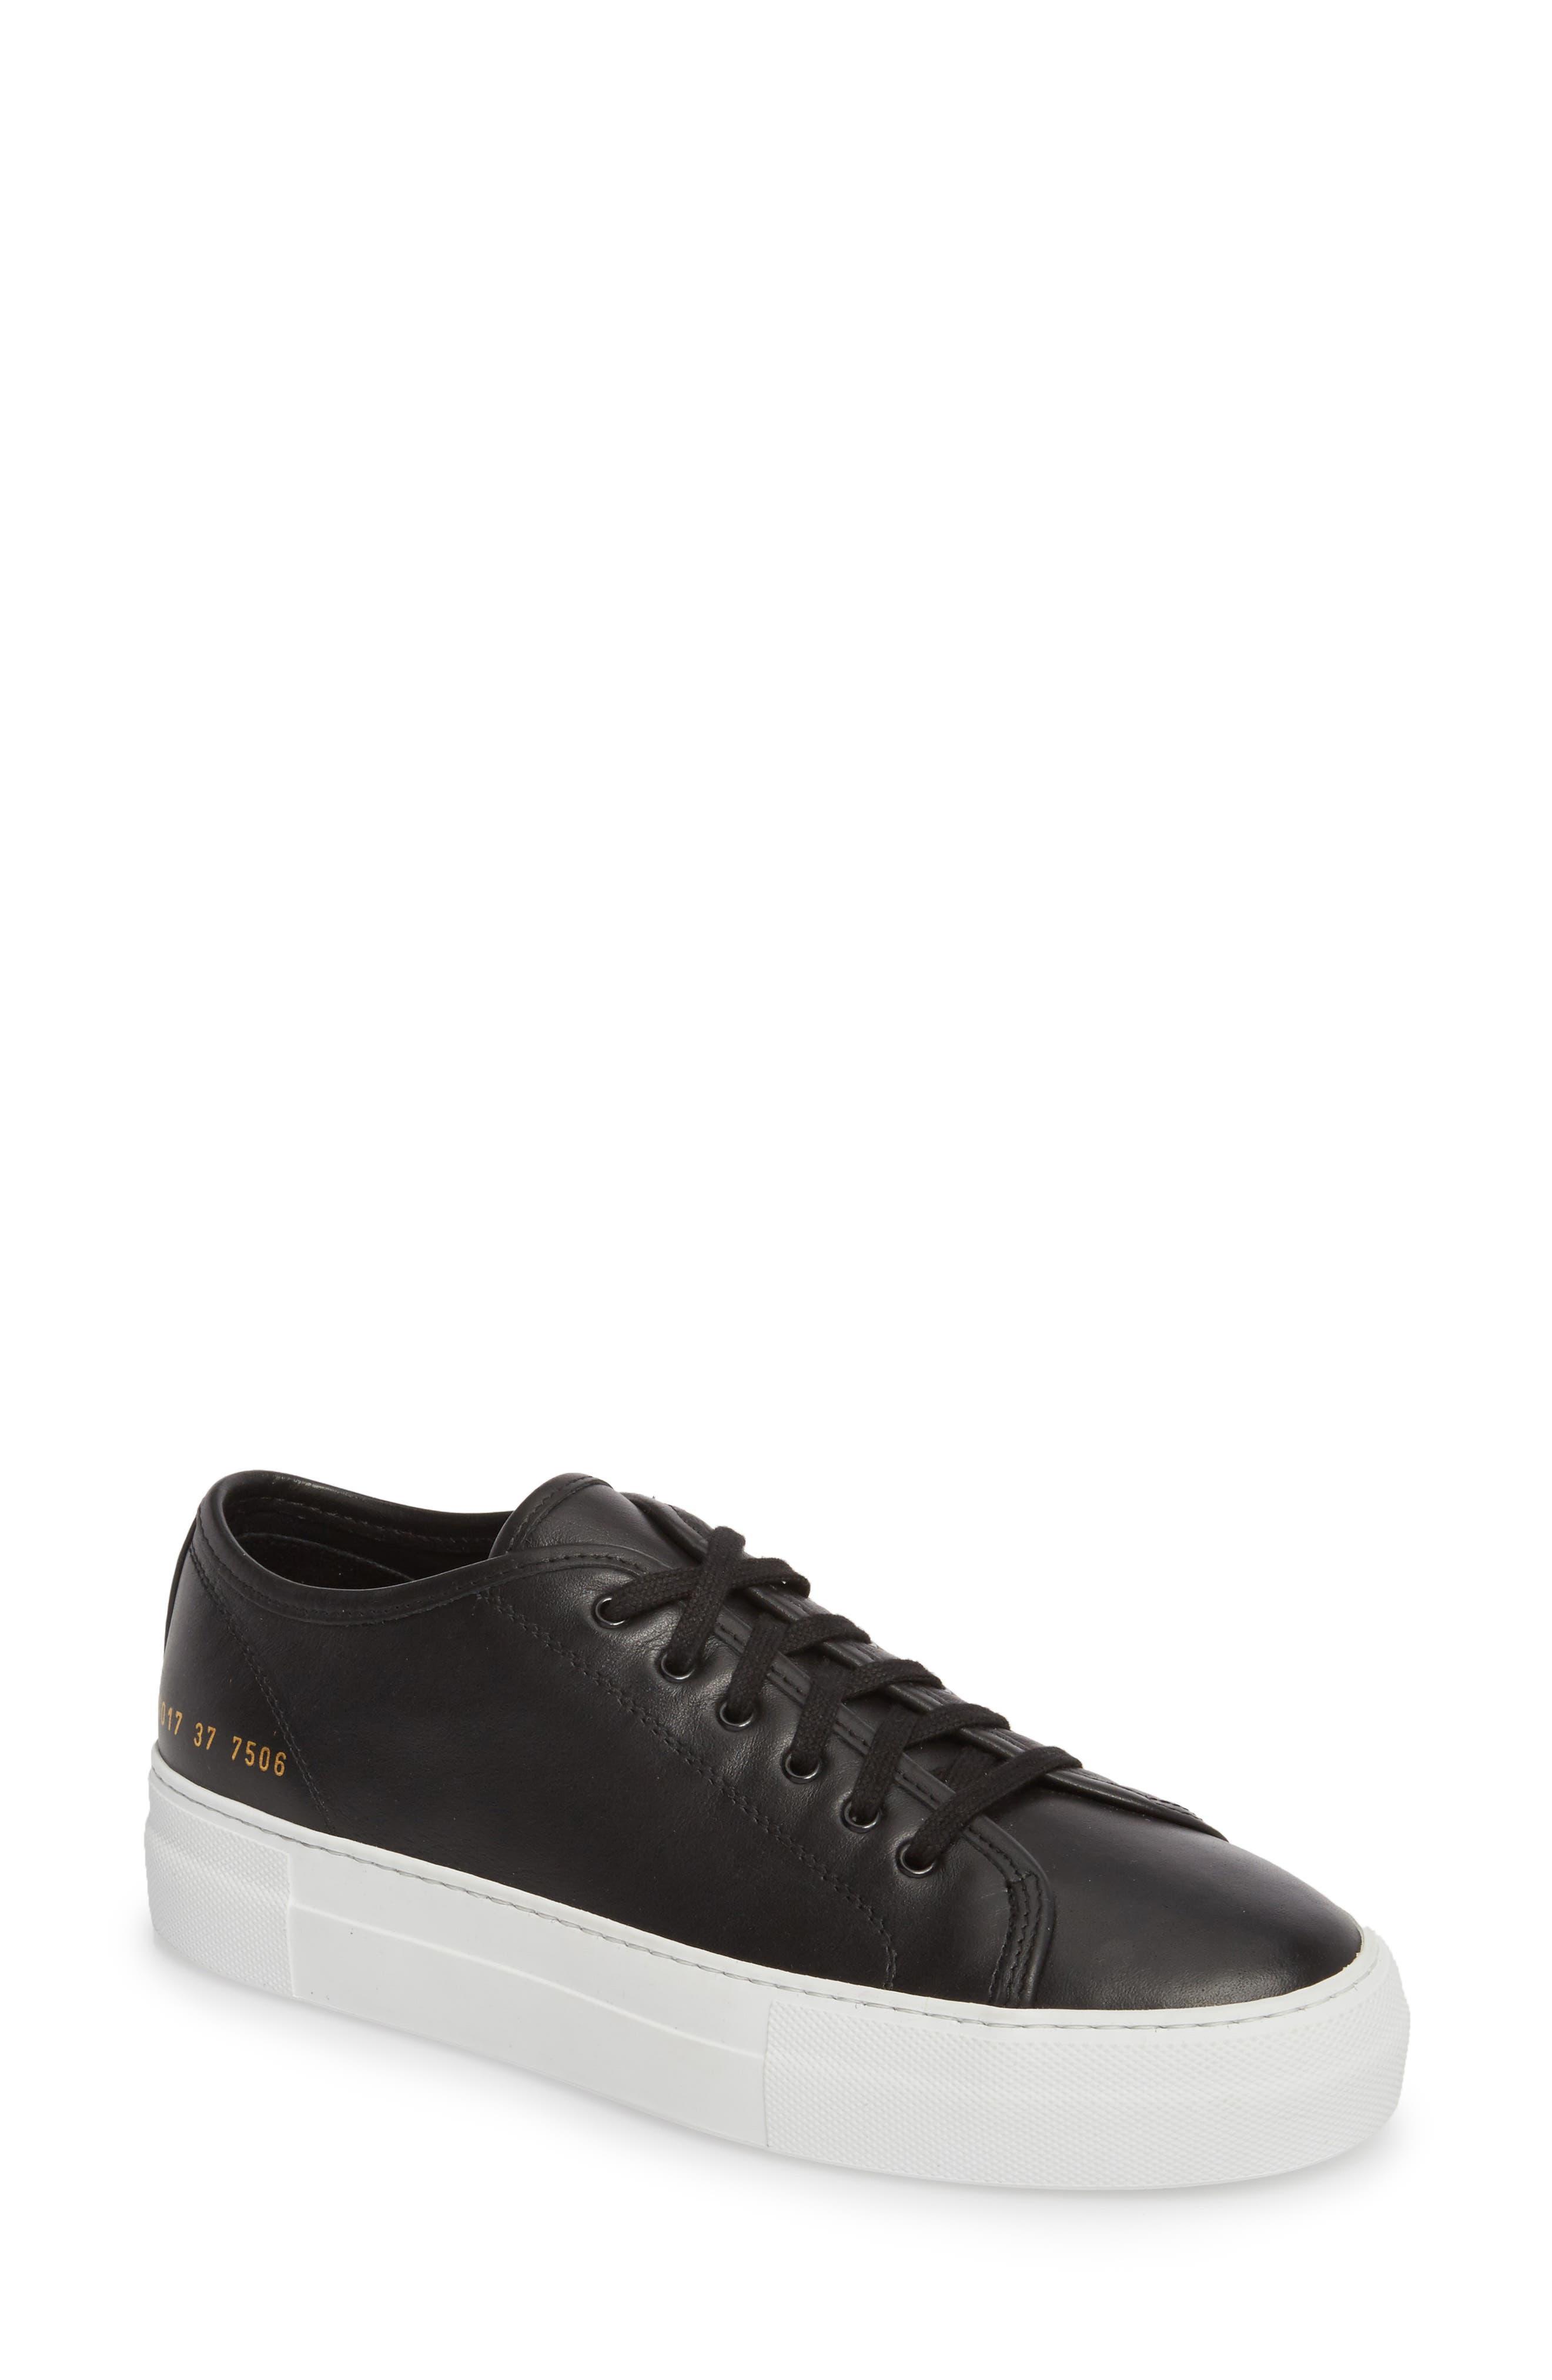 Tournament Low Top Sneaker,                         Main,                         color, Black